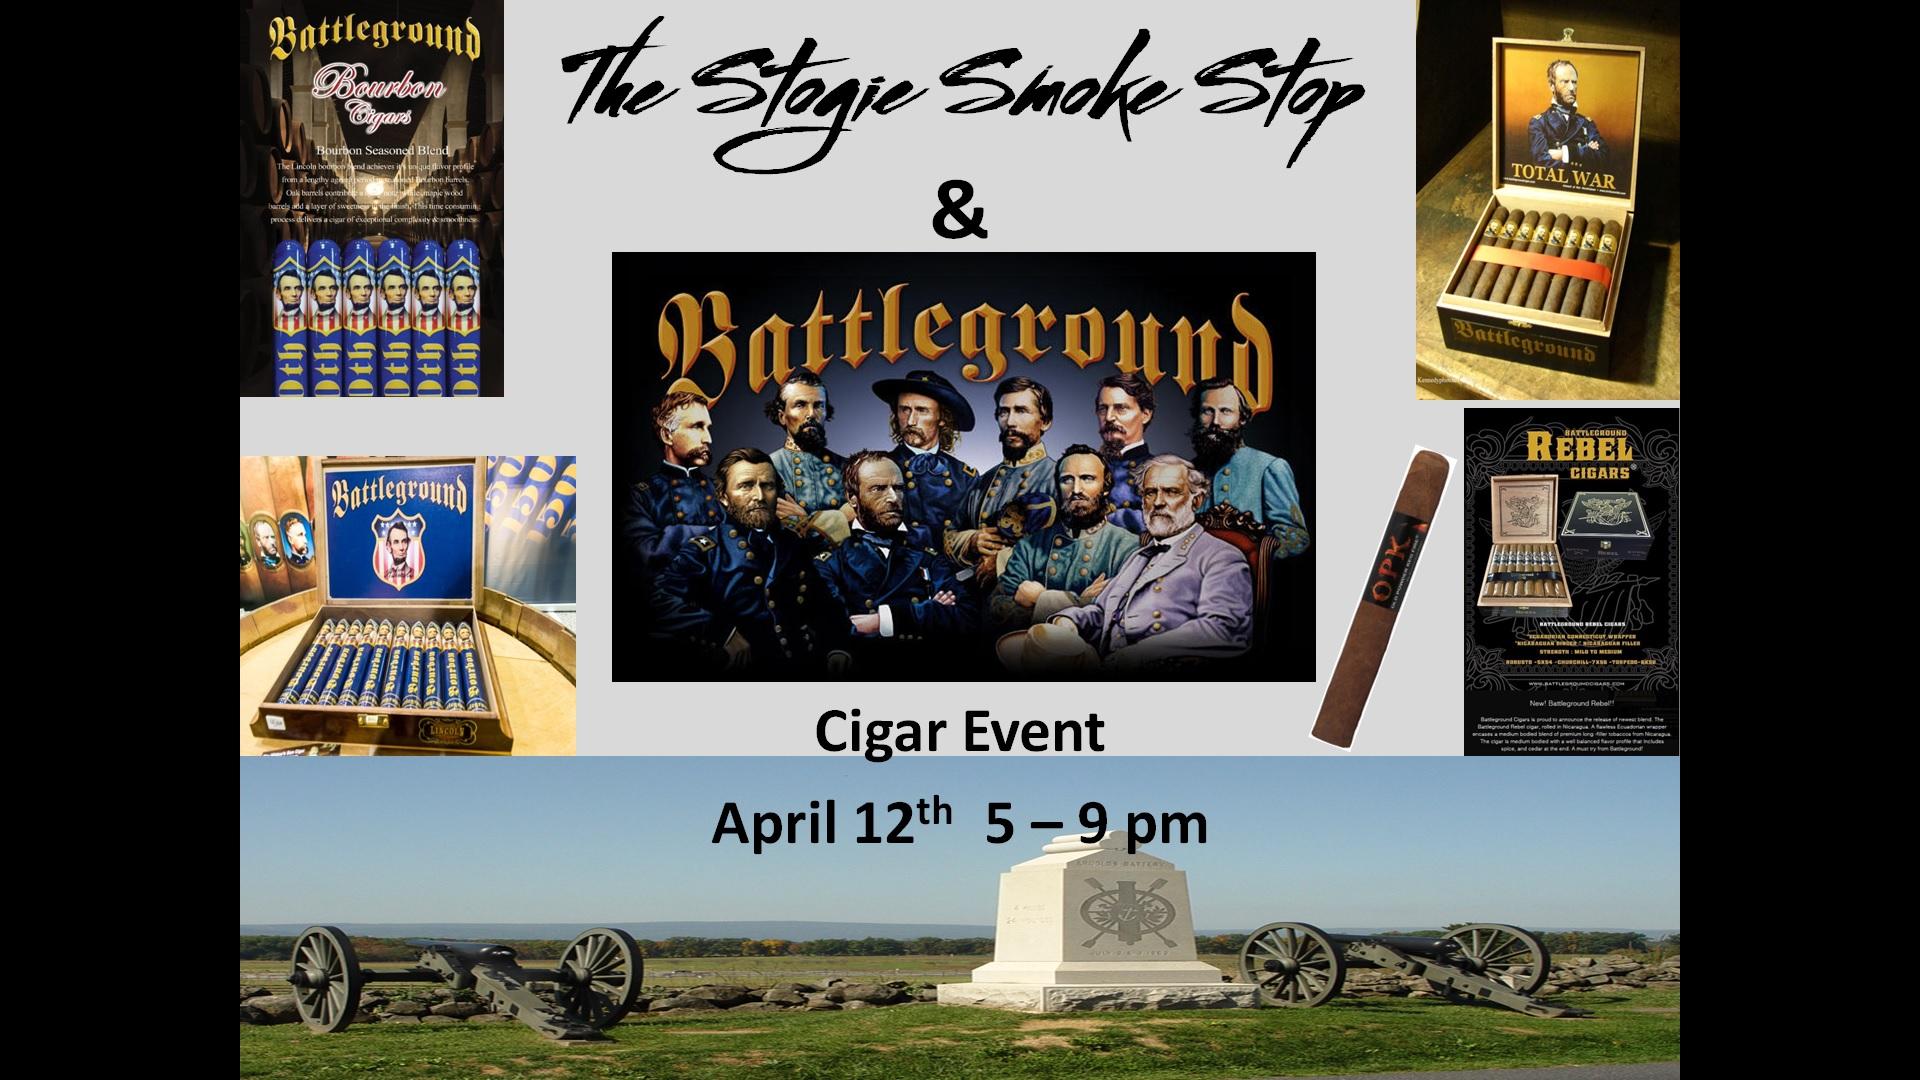 Battleground Cigar Event April 12th 5 - 9 pm